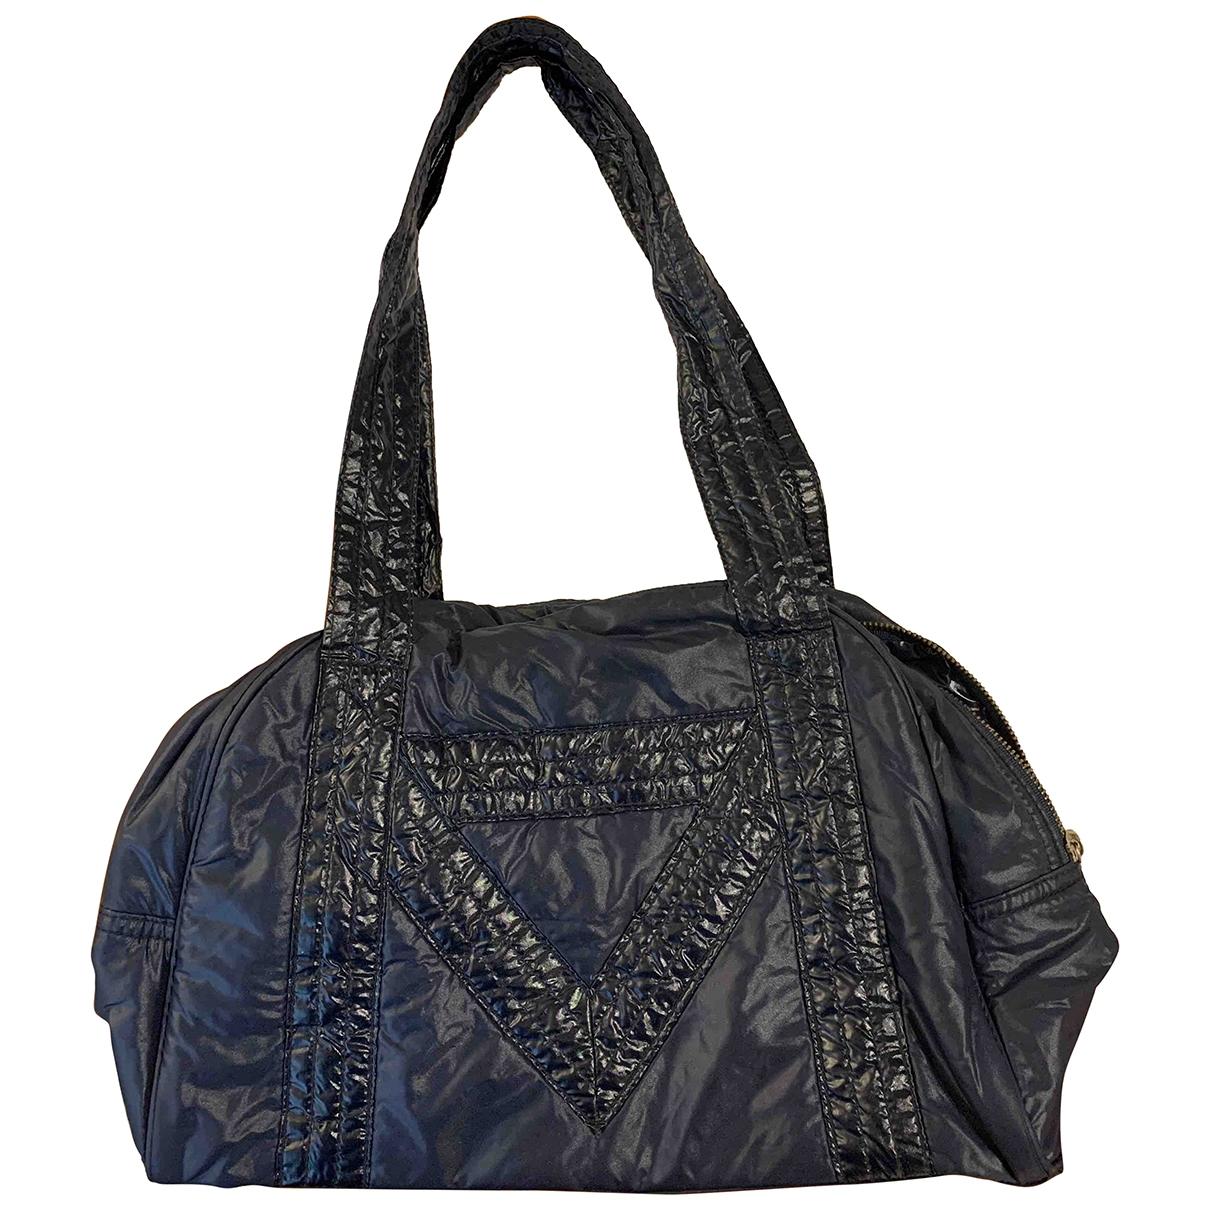 Marella \N Handtasche in  Blau Synthetik